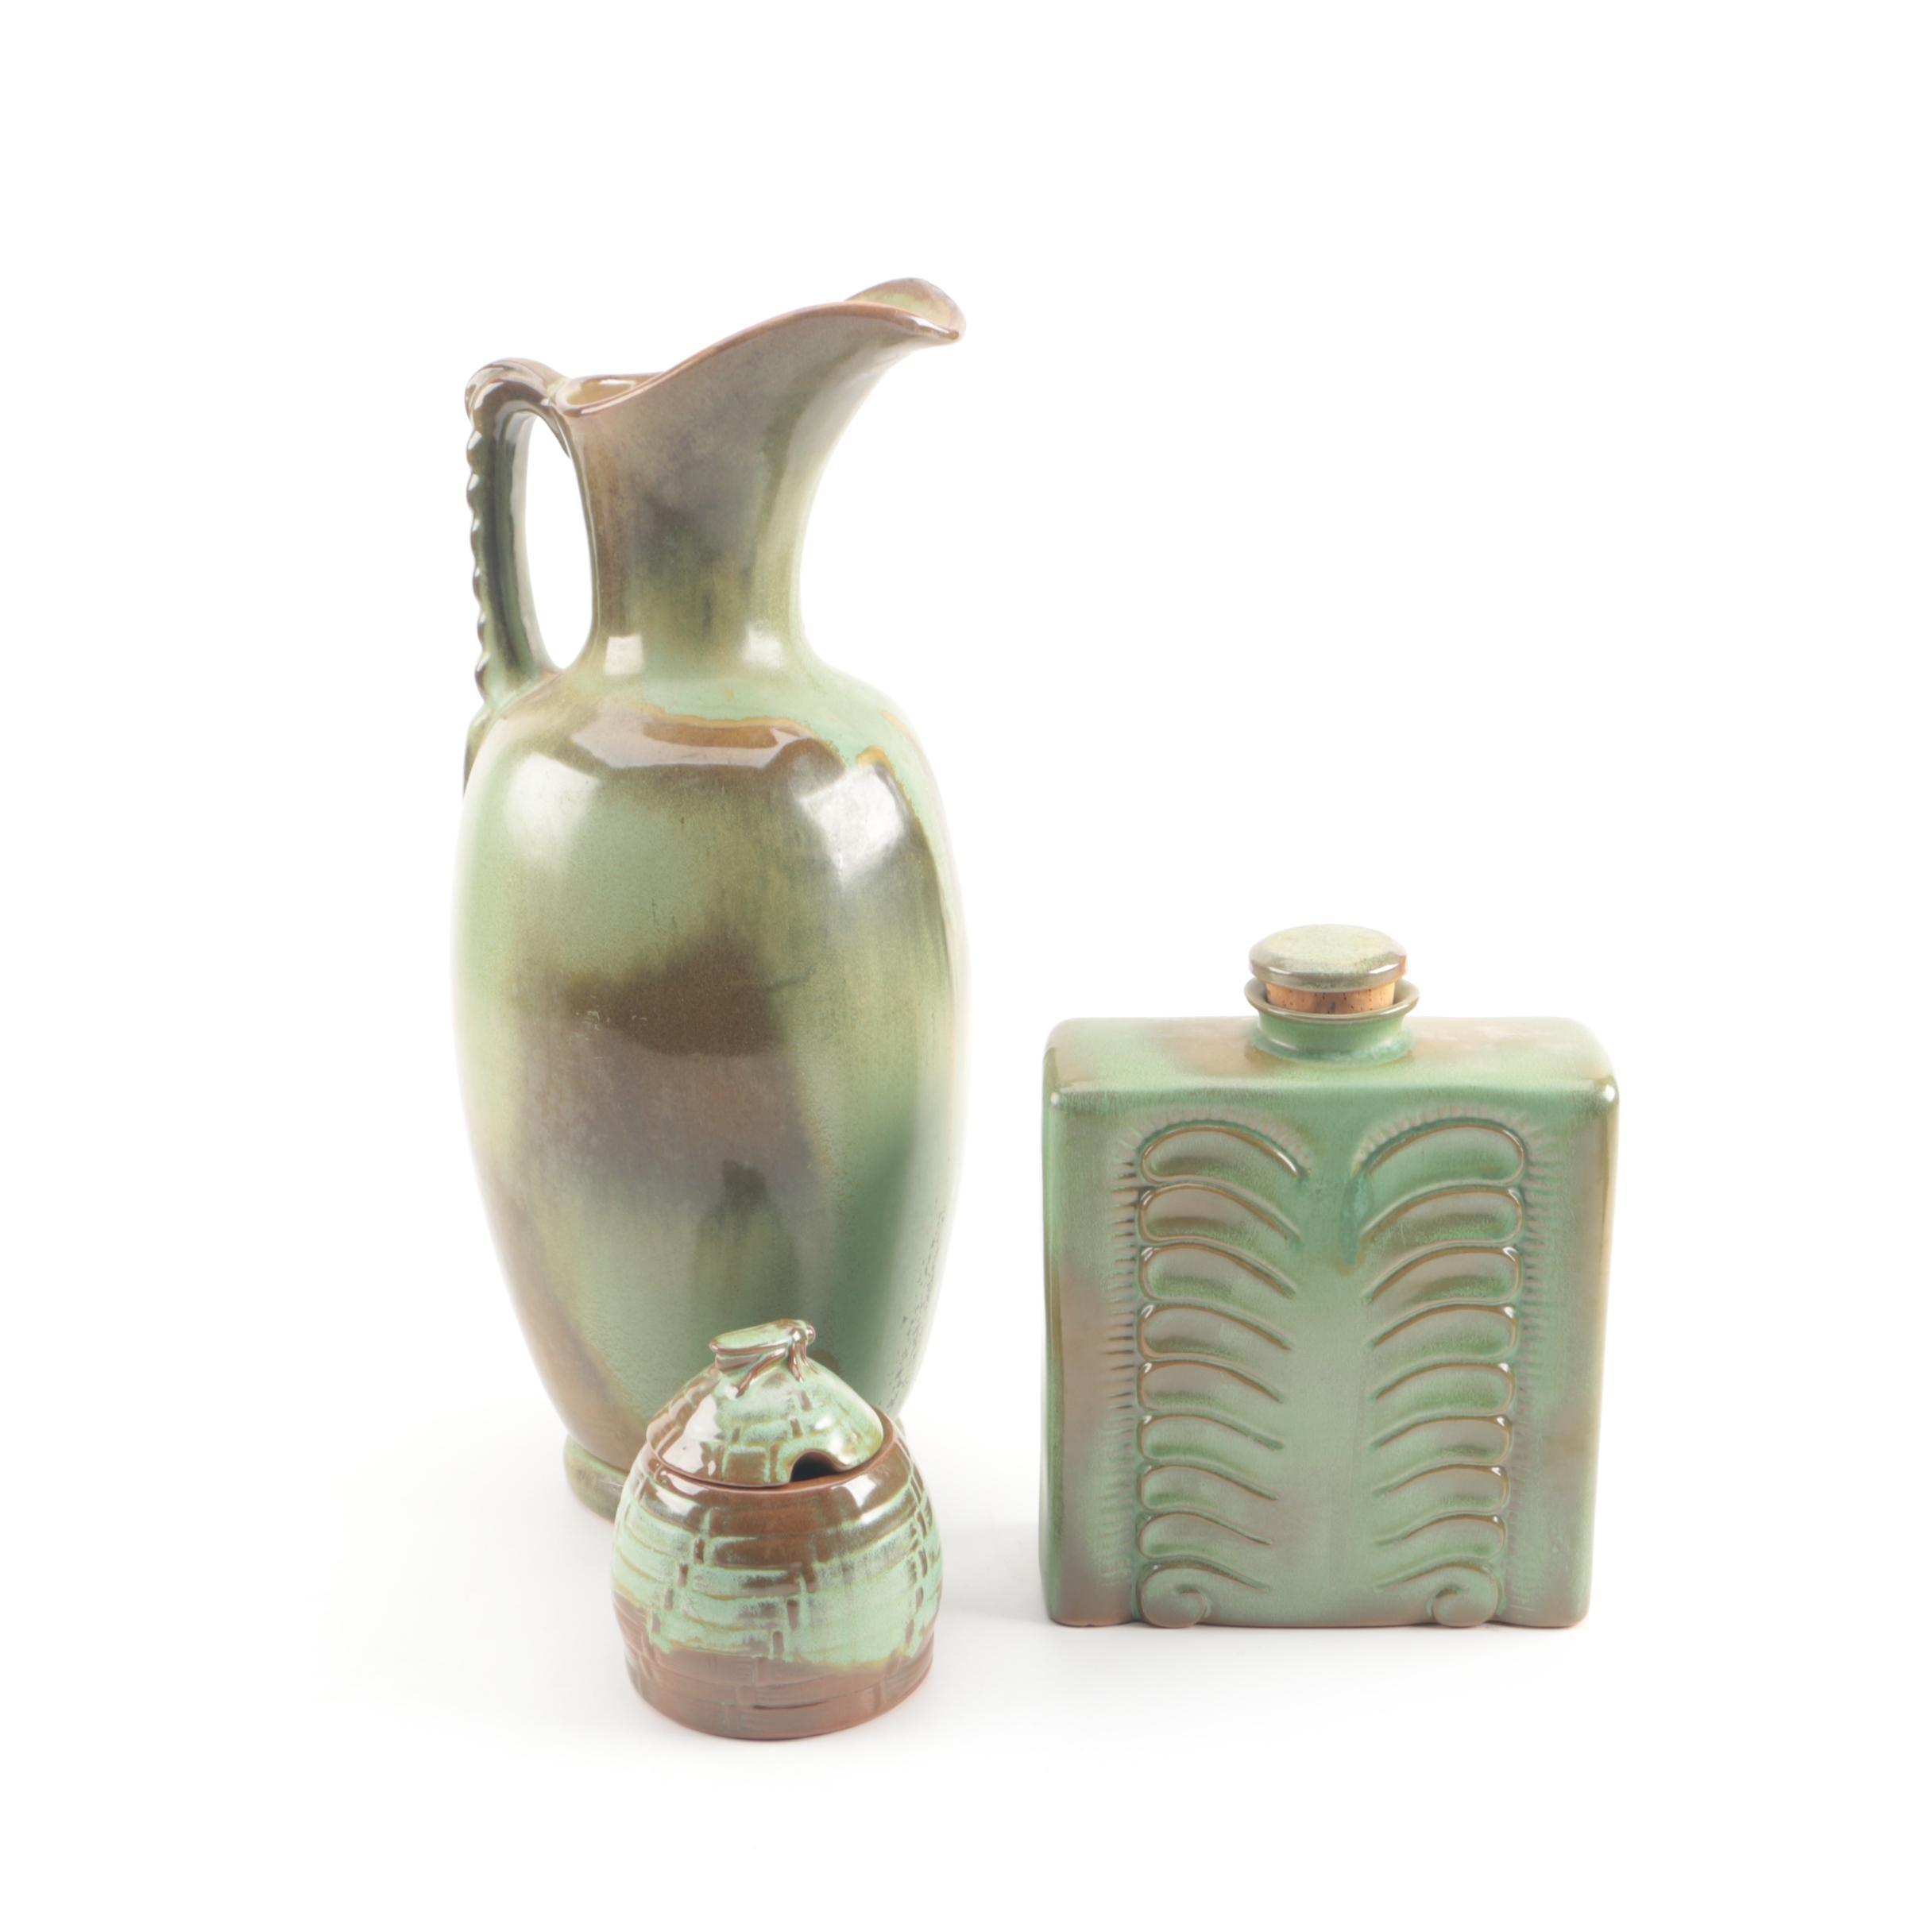 Frankoma Pottery Pitcher, Decanter and Honey Pot